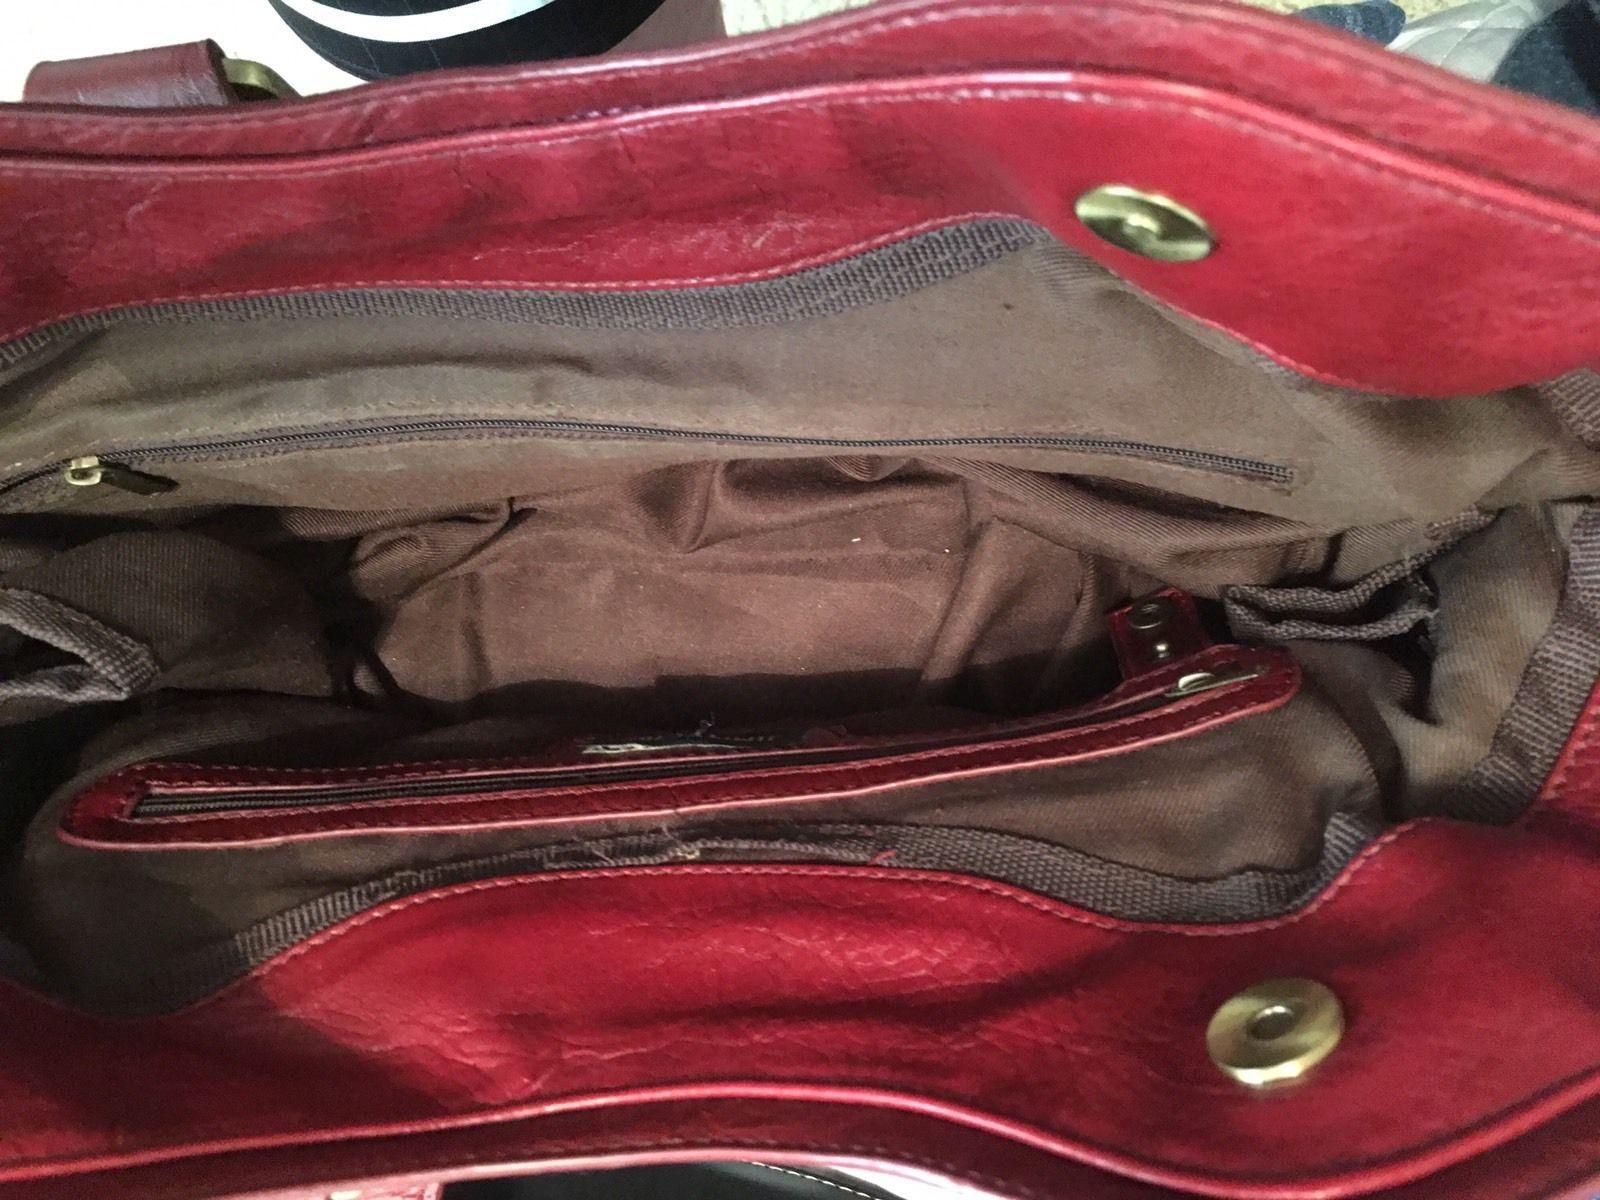 Jimmy Choo Used Leather Bag 50 0